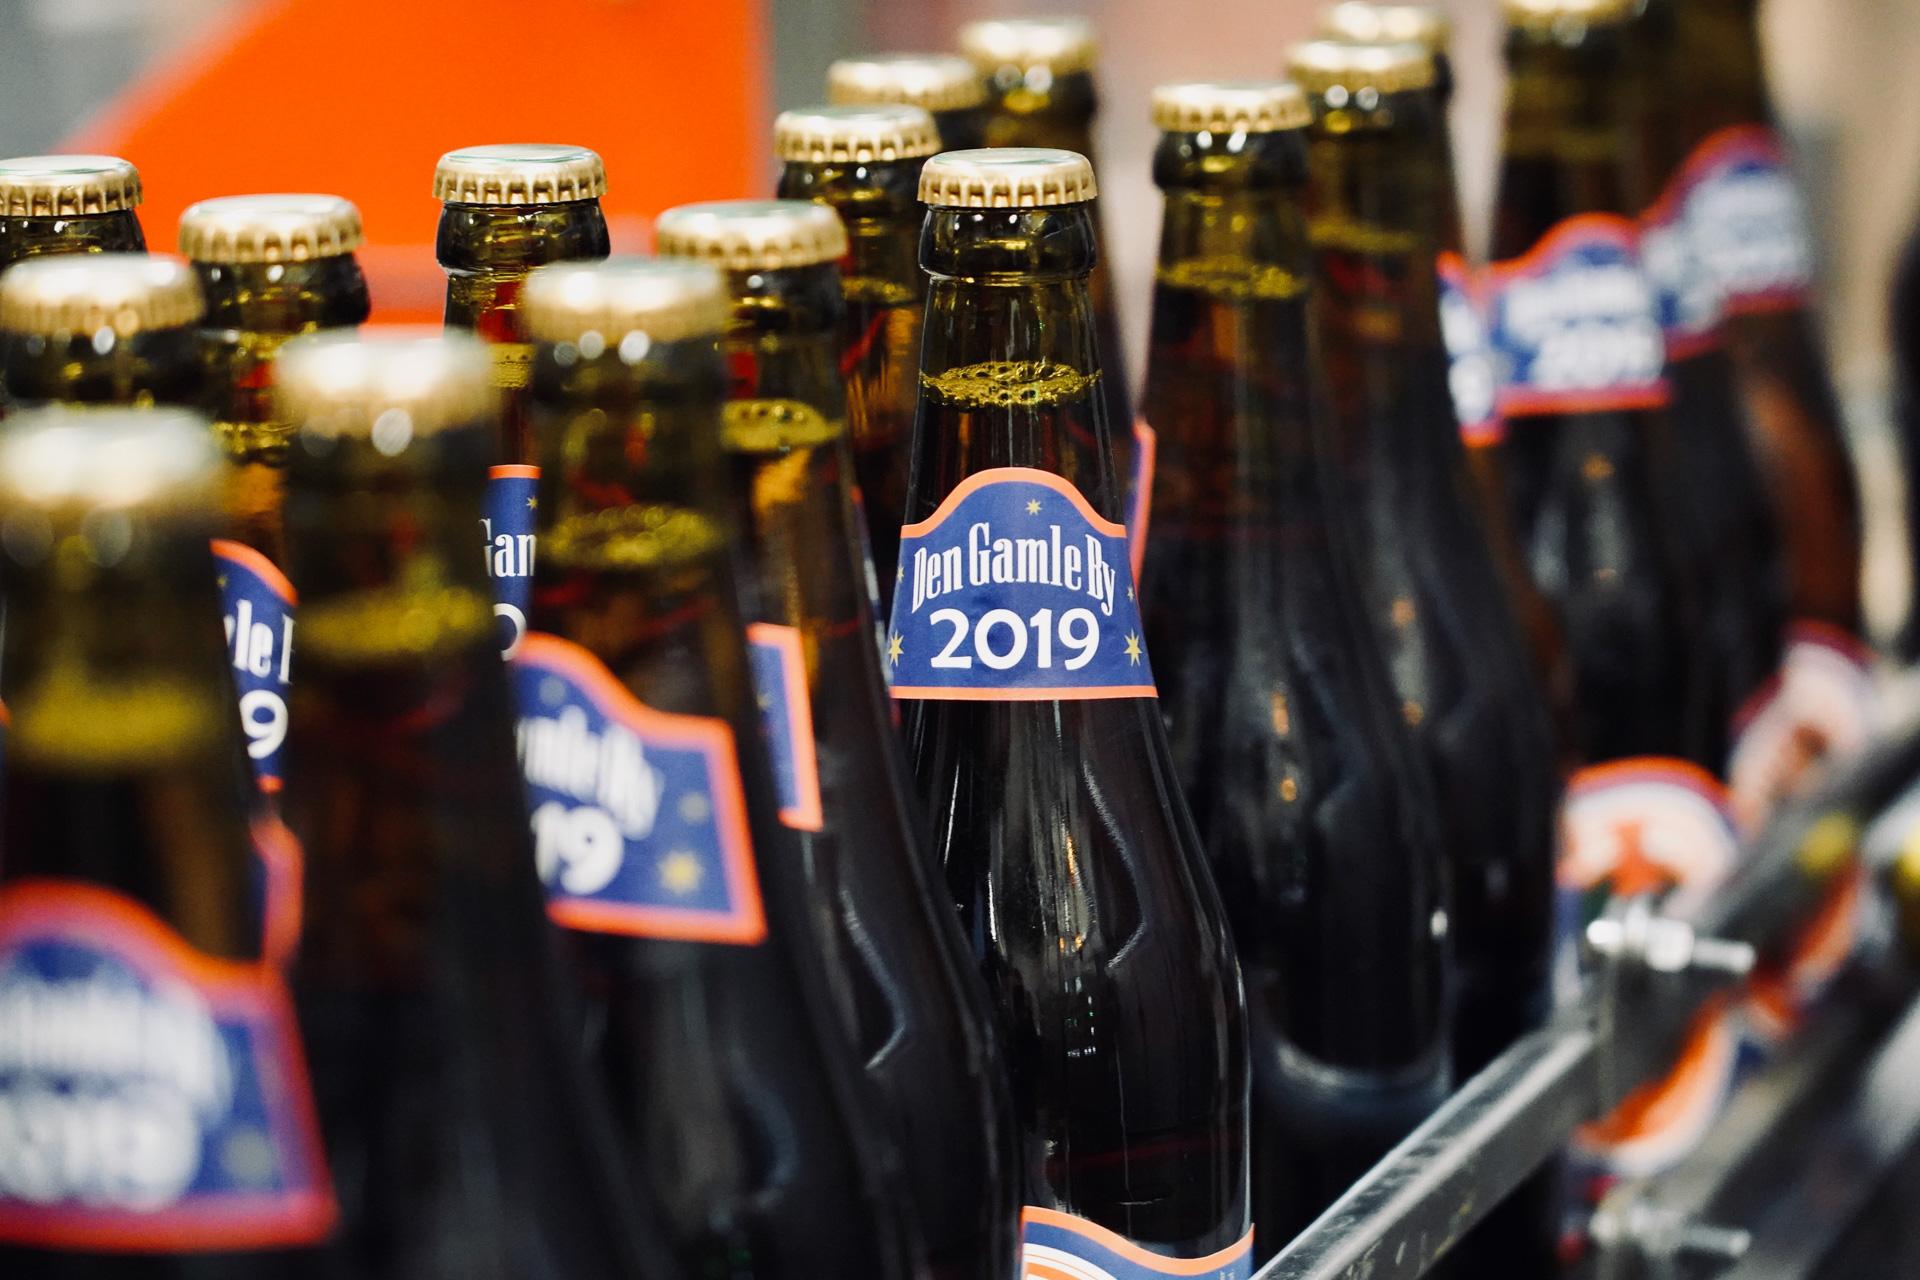 BENT J-DAG:Den Gamle By udvider ølfesten